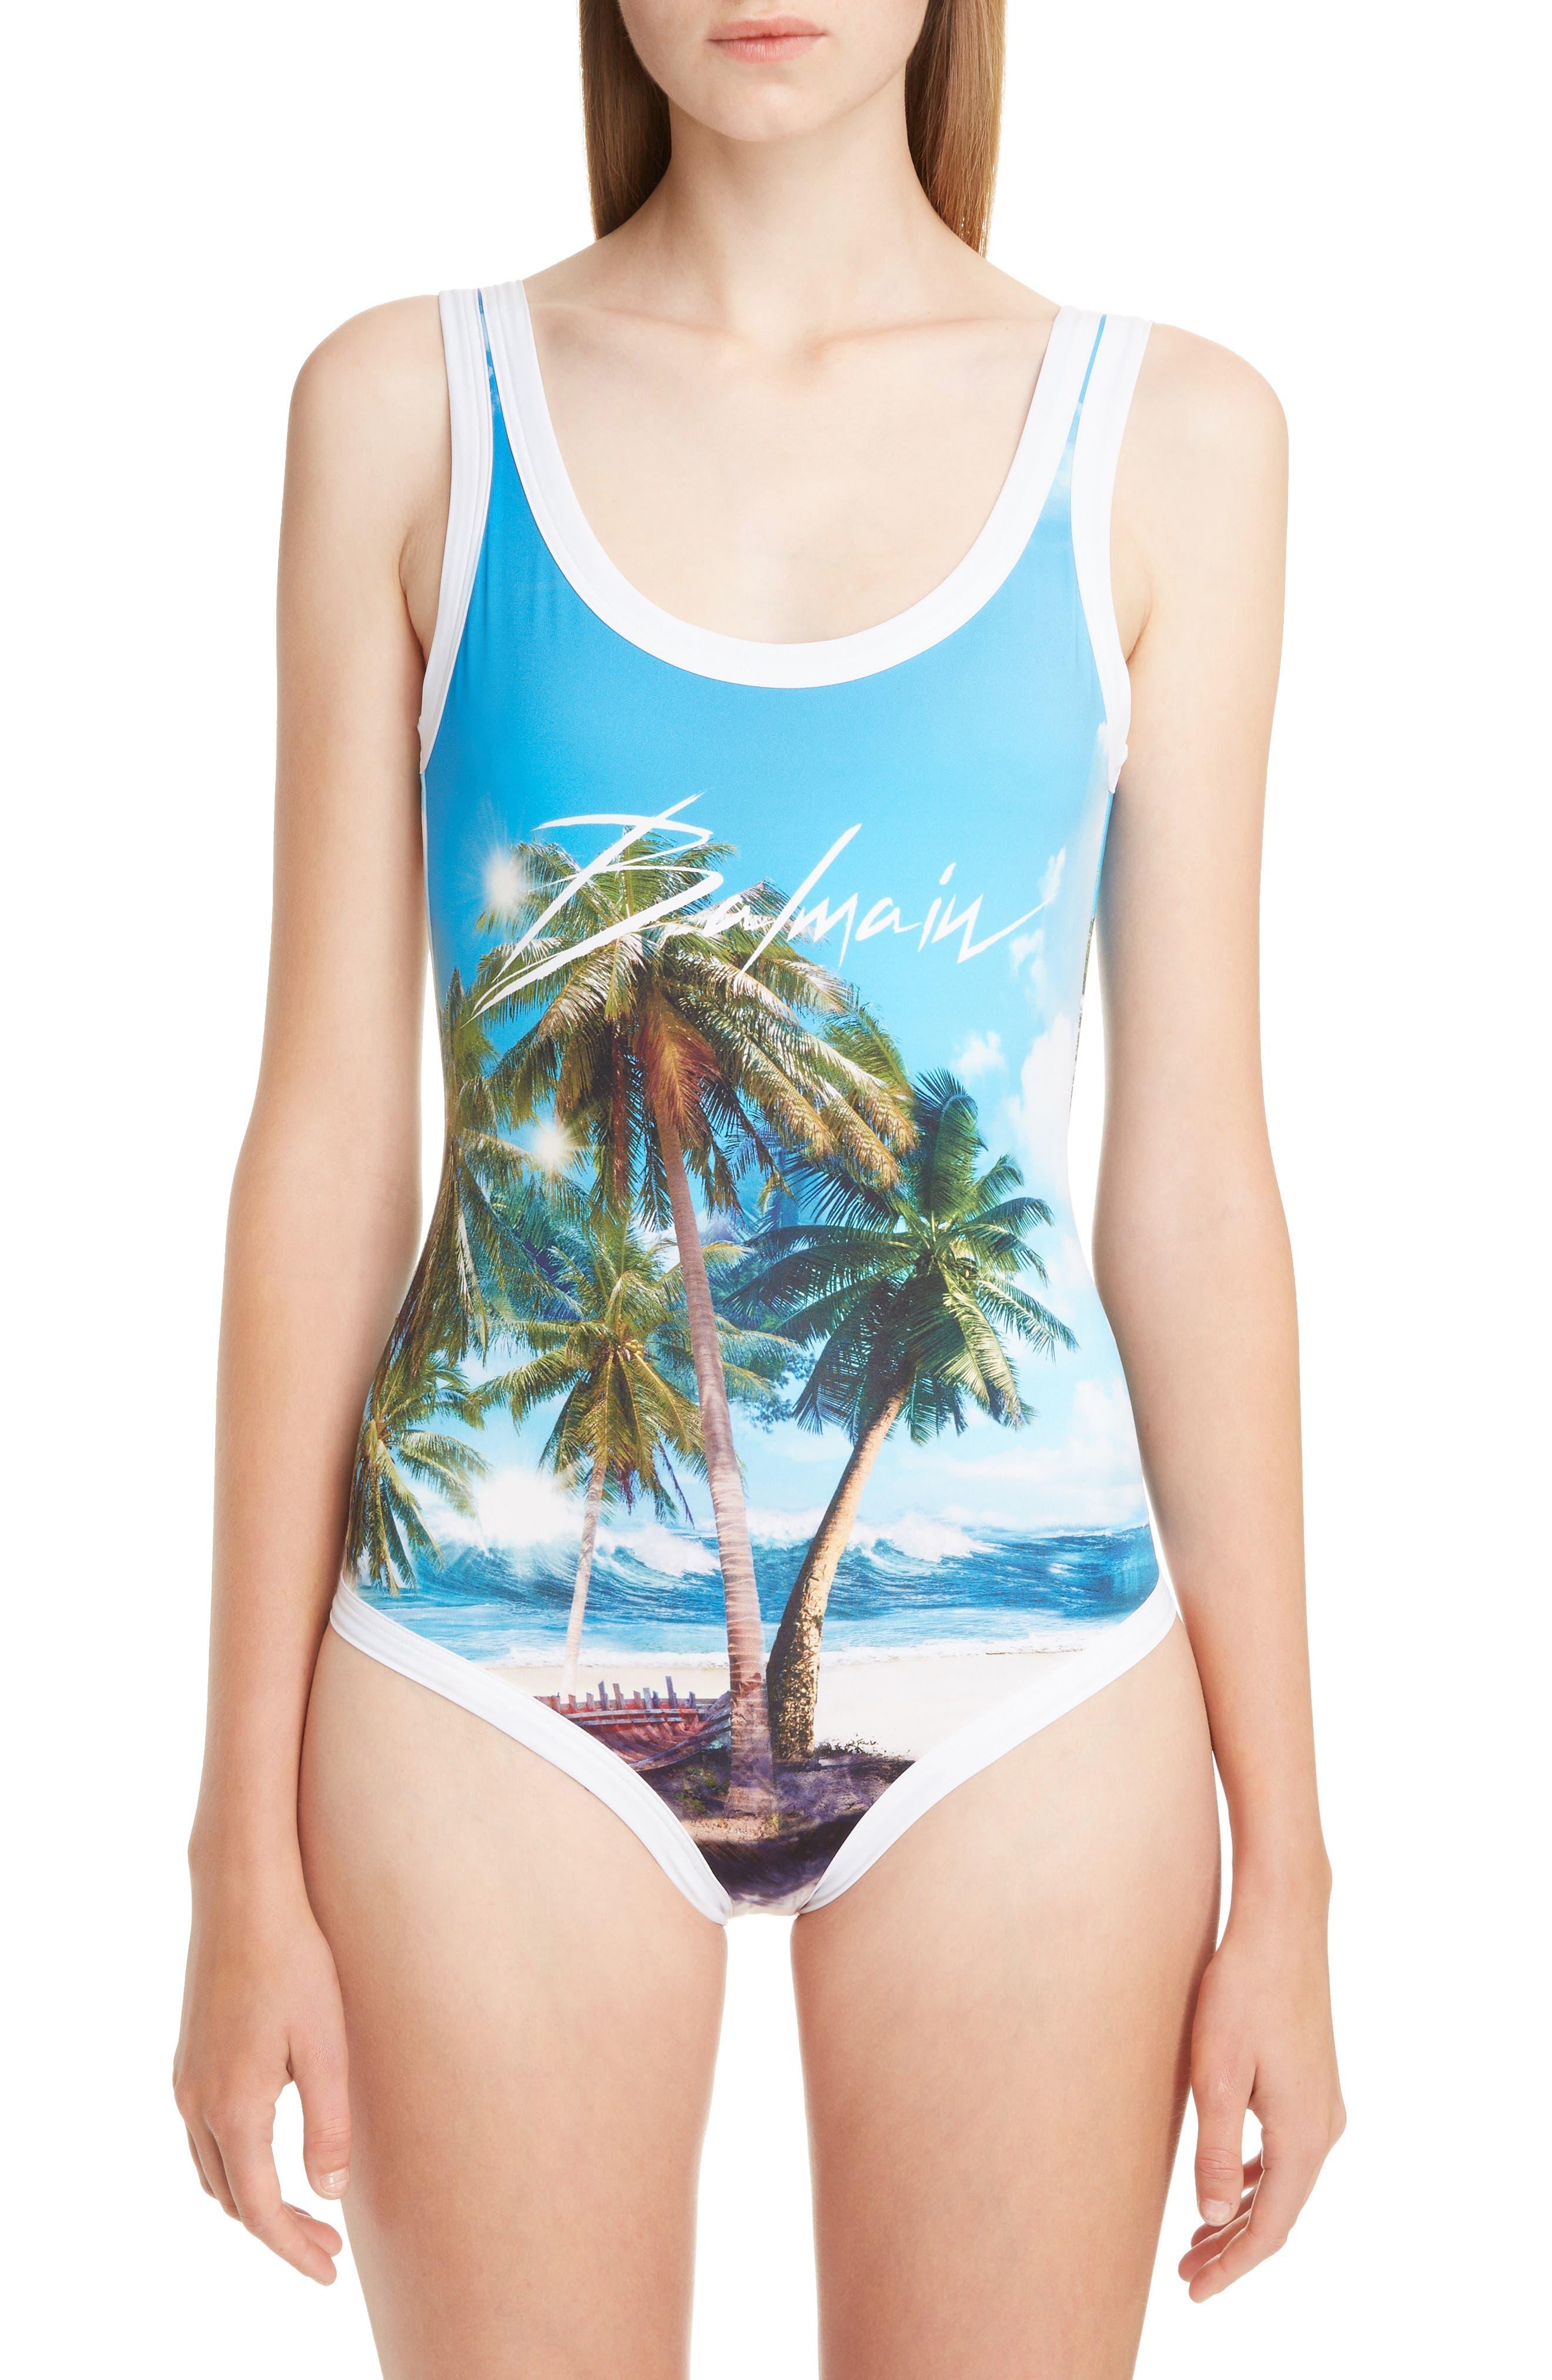 Balmain Beach Print One-Piece Swimsuit, Blue